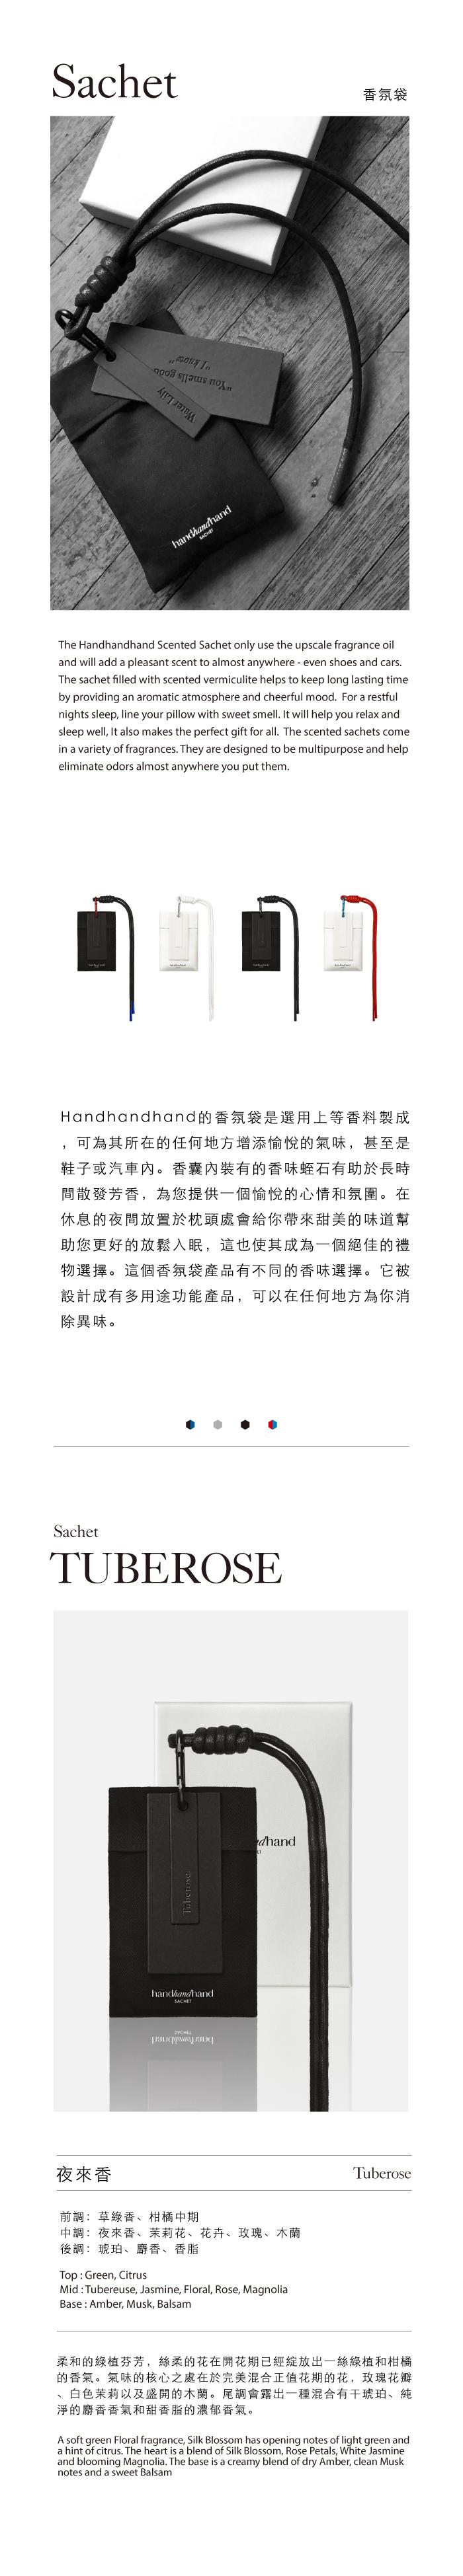 handhandhand|HHH香氛袋 (夜來香)